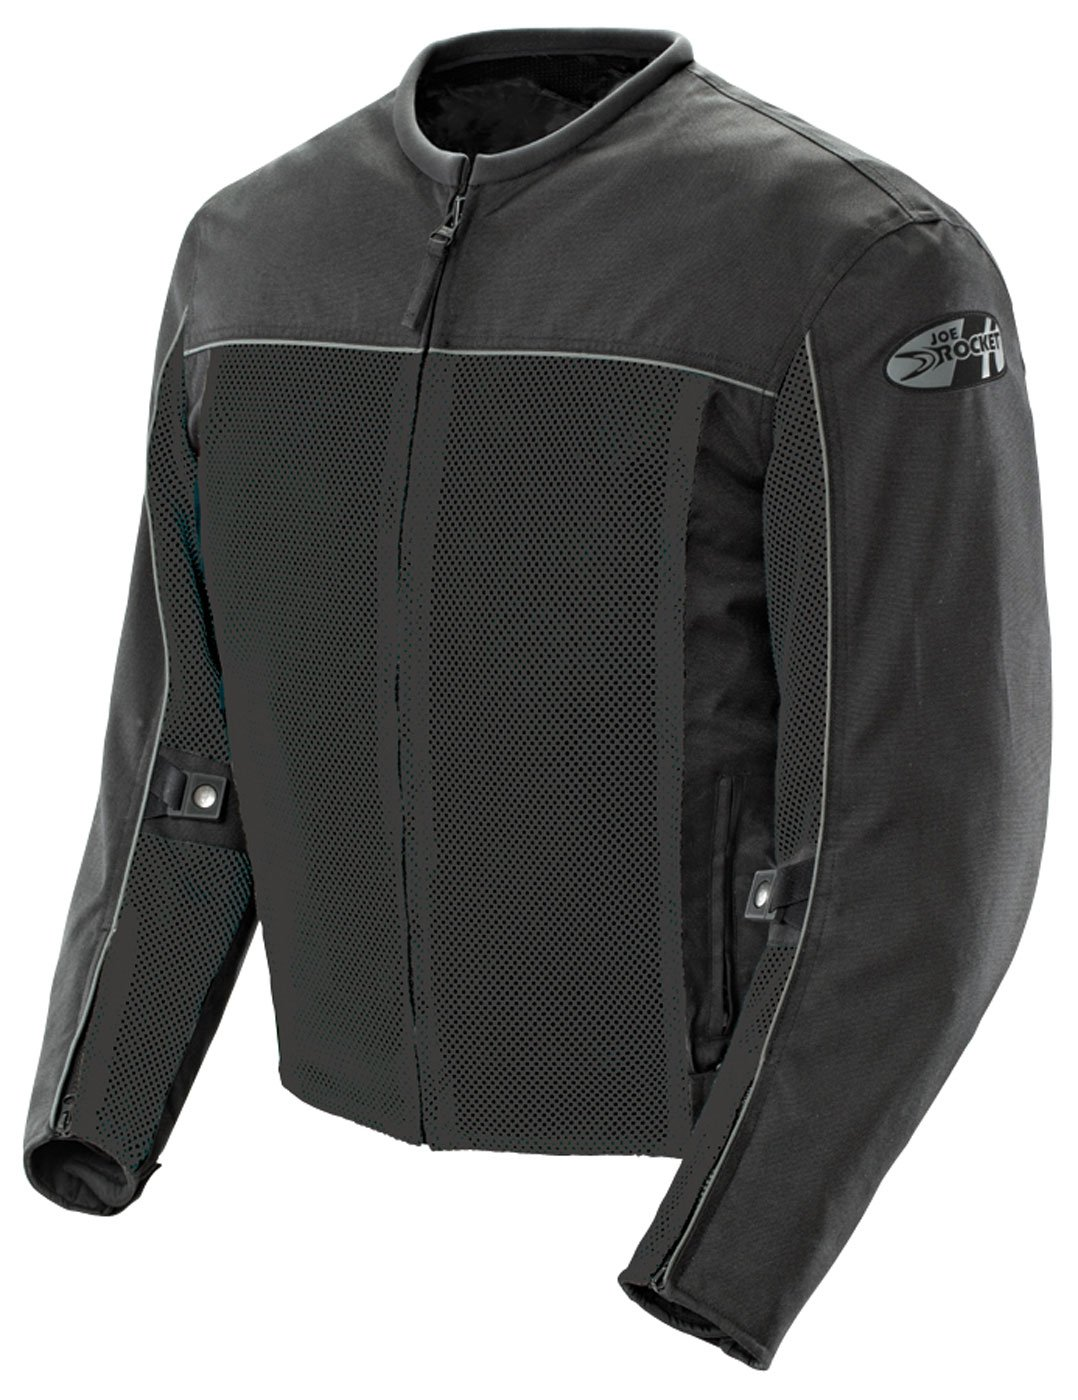 X-Large 1254-0205 Joe Rocket Velocity Black//Blue Mesh Motorcycle Jacket